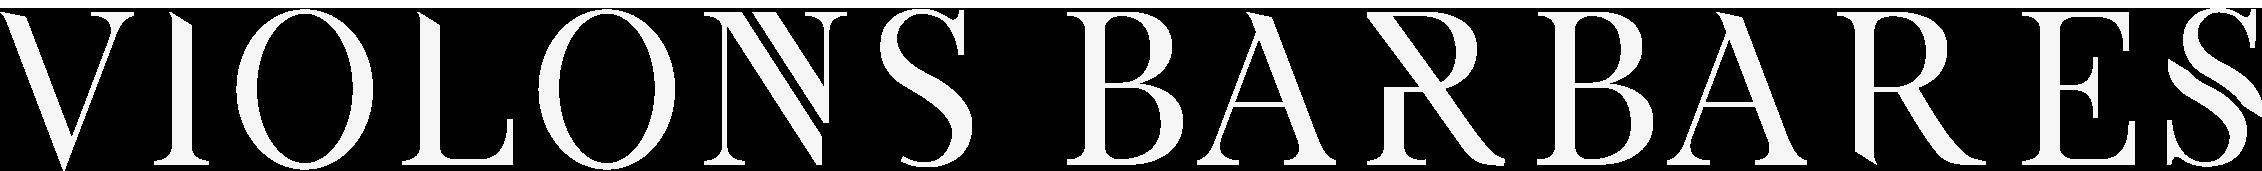 Violons barbares - logo